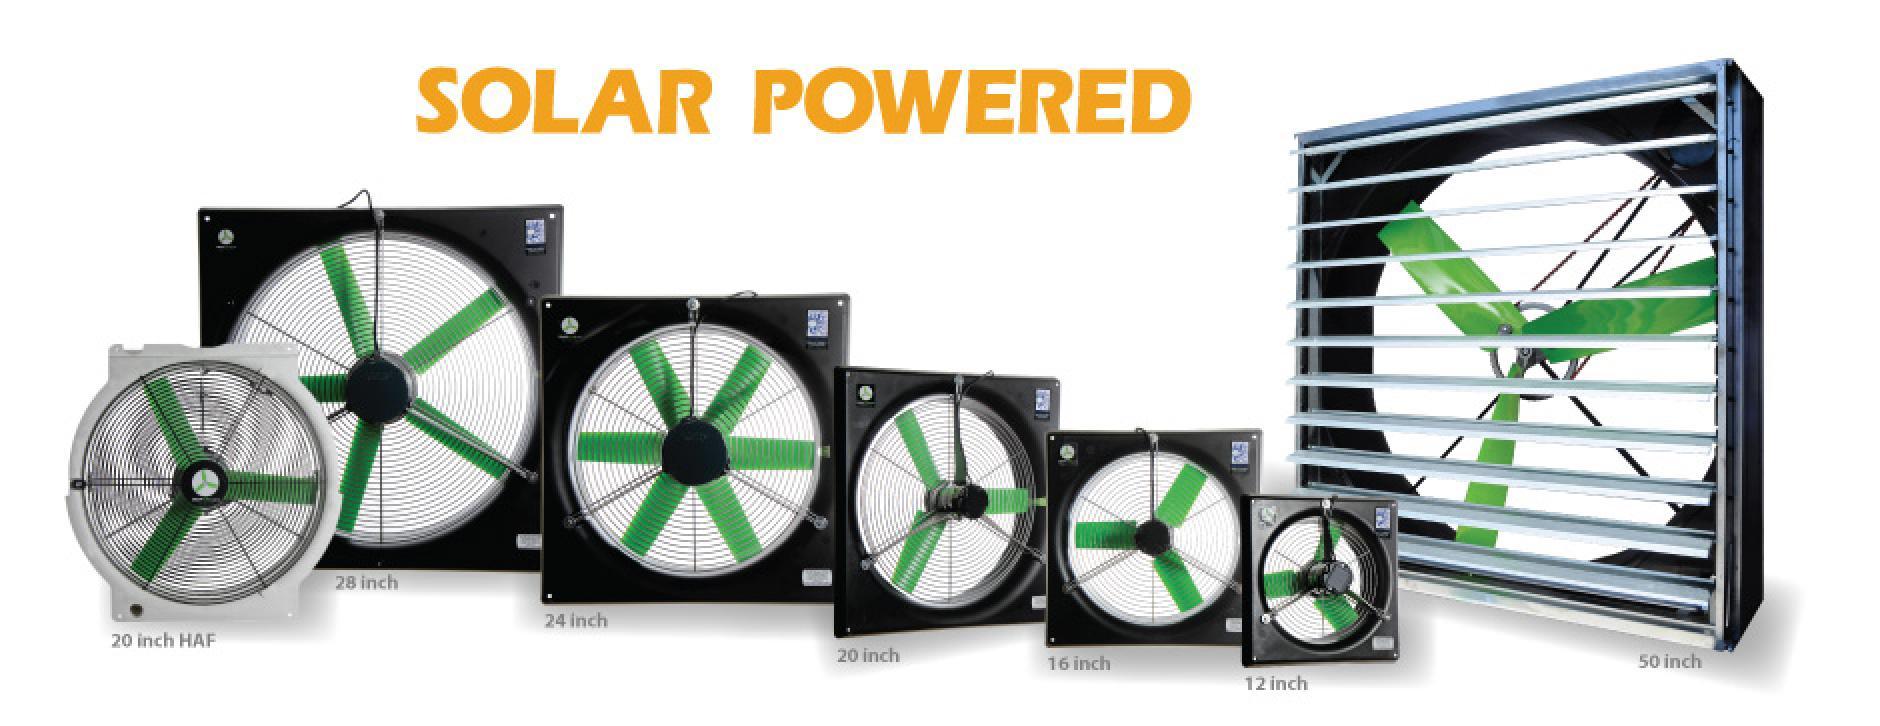 Snap Fan Solar National Air Propulsion